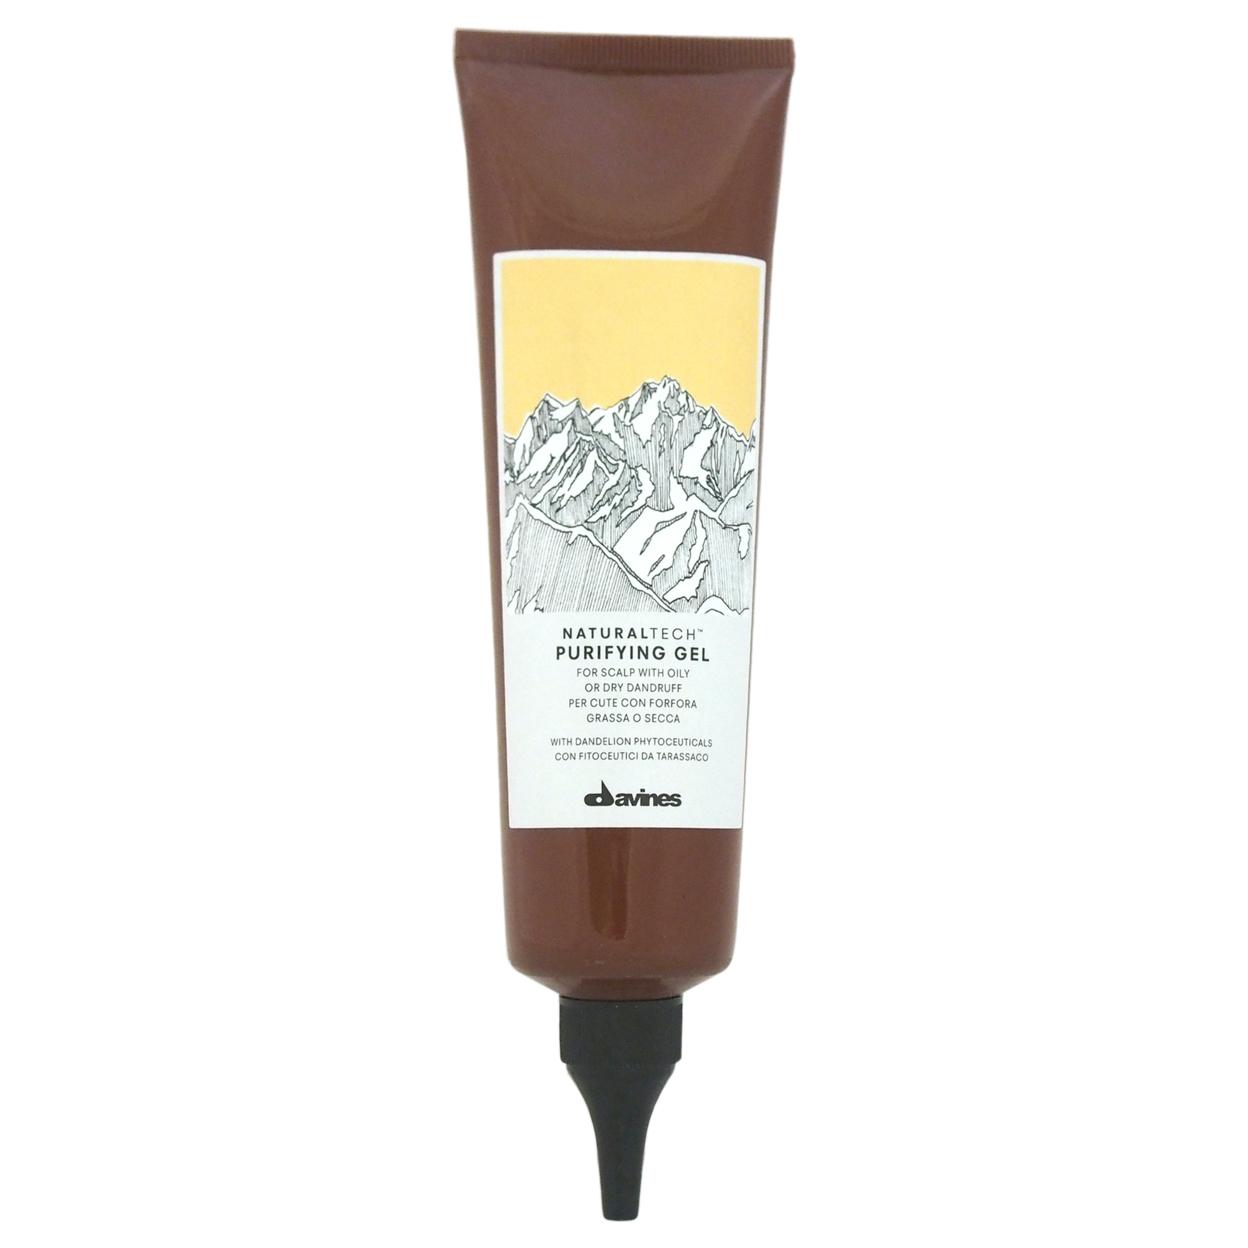 Naturaltech Purifying Gel by Davines for Unisex - 5.07 oz Hair Gel 583c6c33e2246159f435c7c6